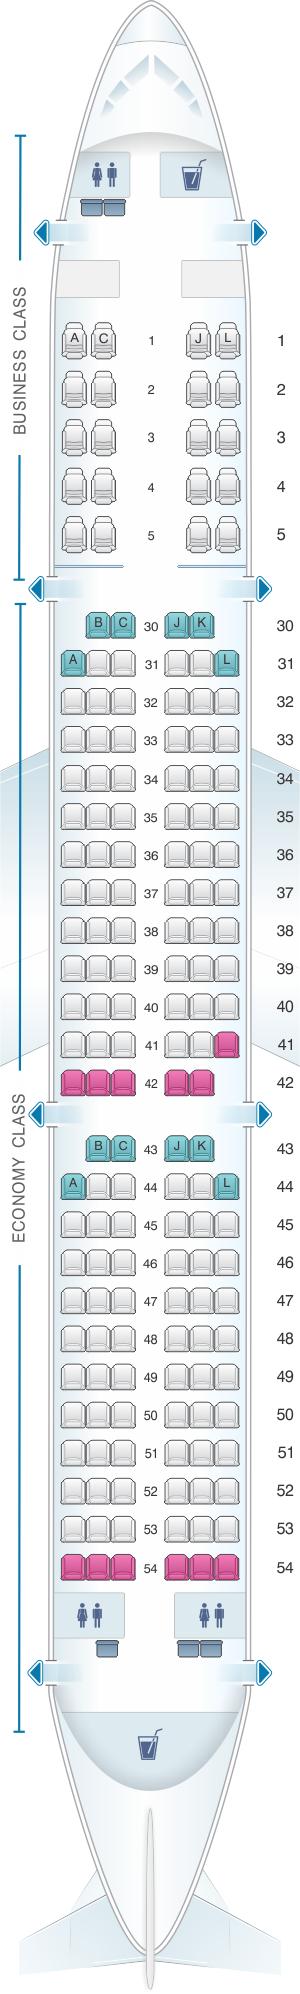 Seat map for Saudi Arabian Airlines Airbus A321